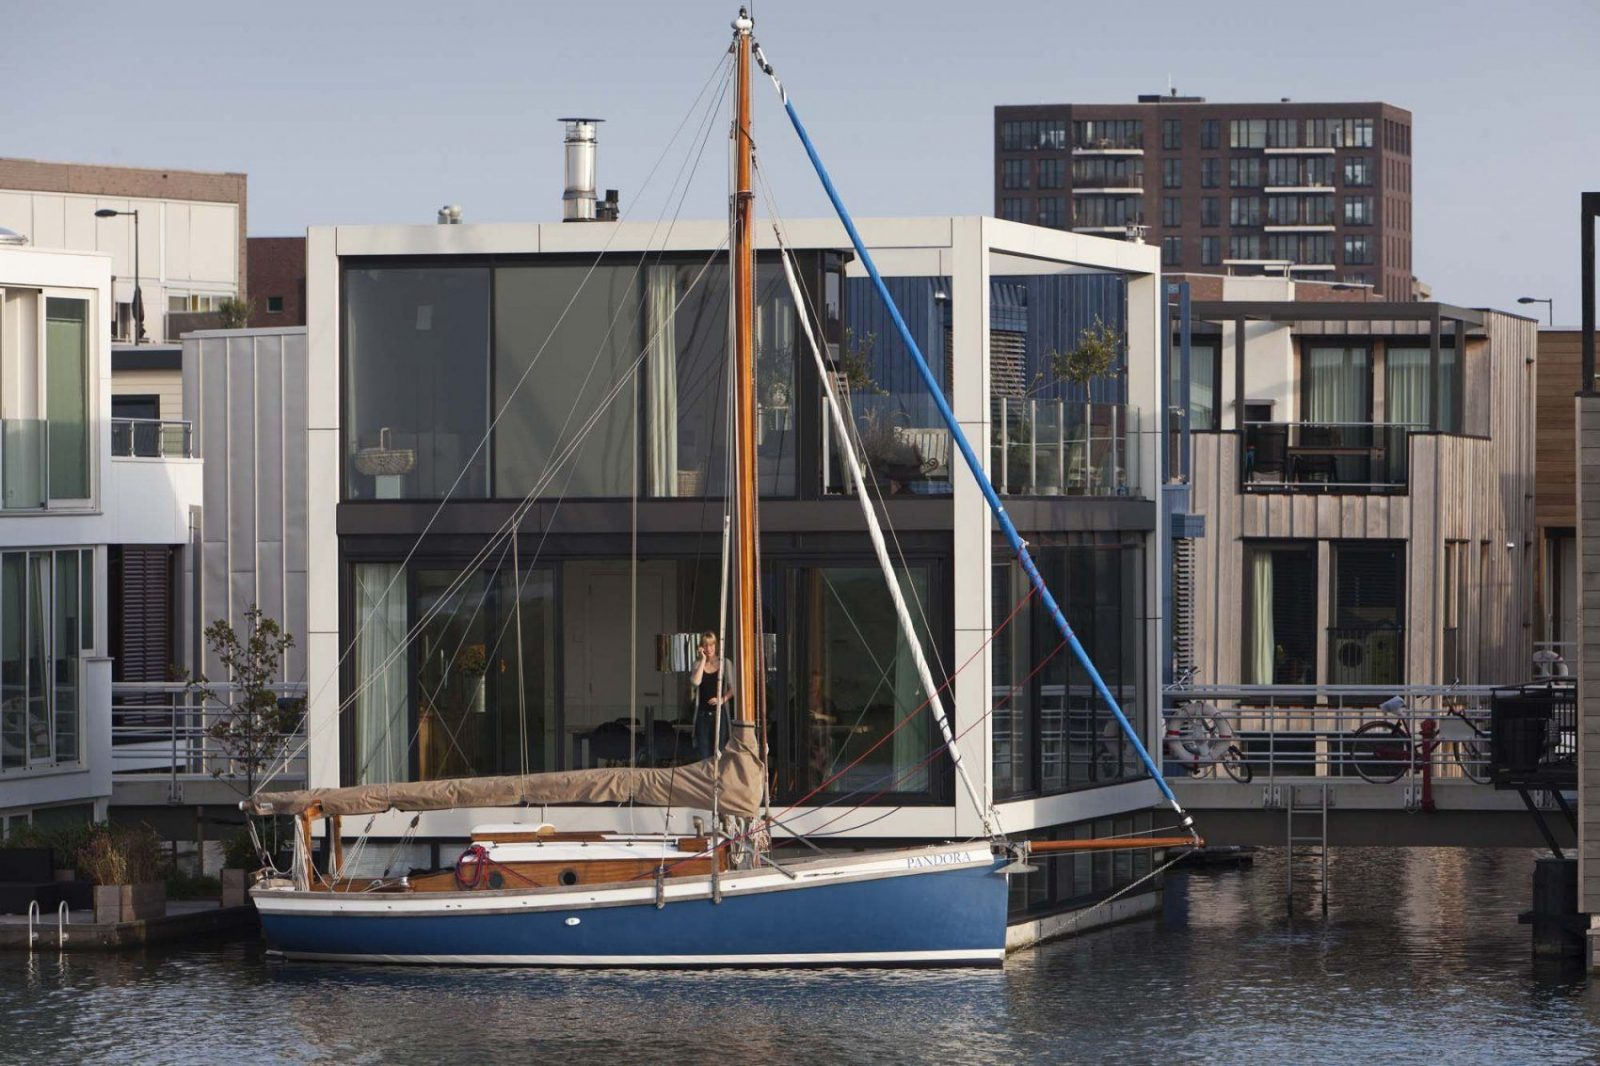 ponton hausboot selber bauen great ht houseboats hausboote zum von ponton hausboot selber bauen. Black Bedroom Furniture Sets. Home Design Ideas